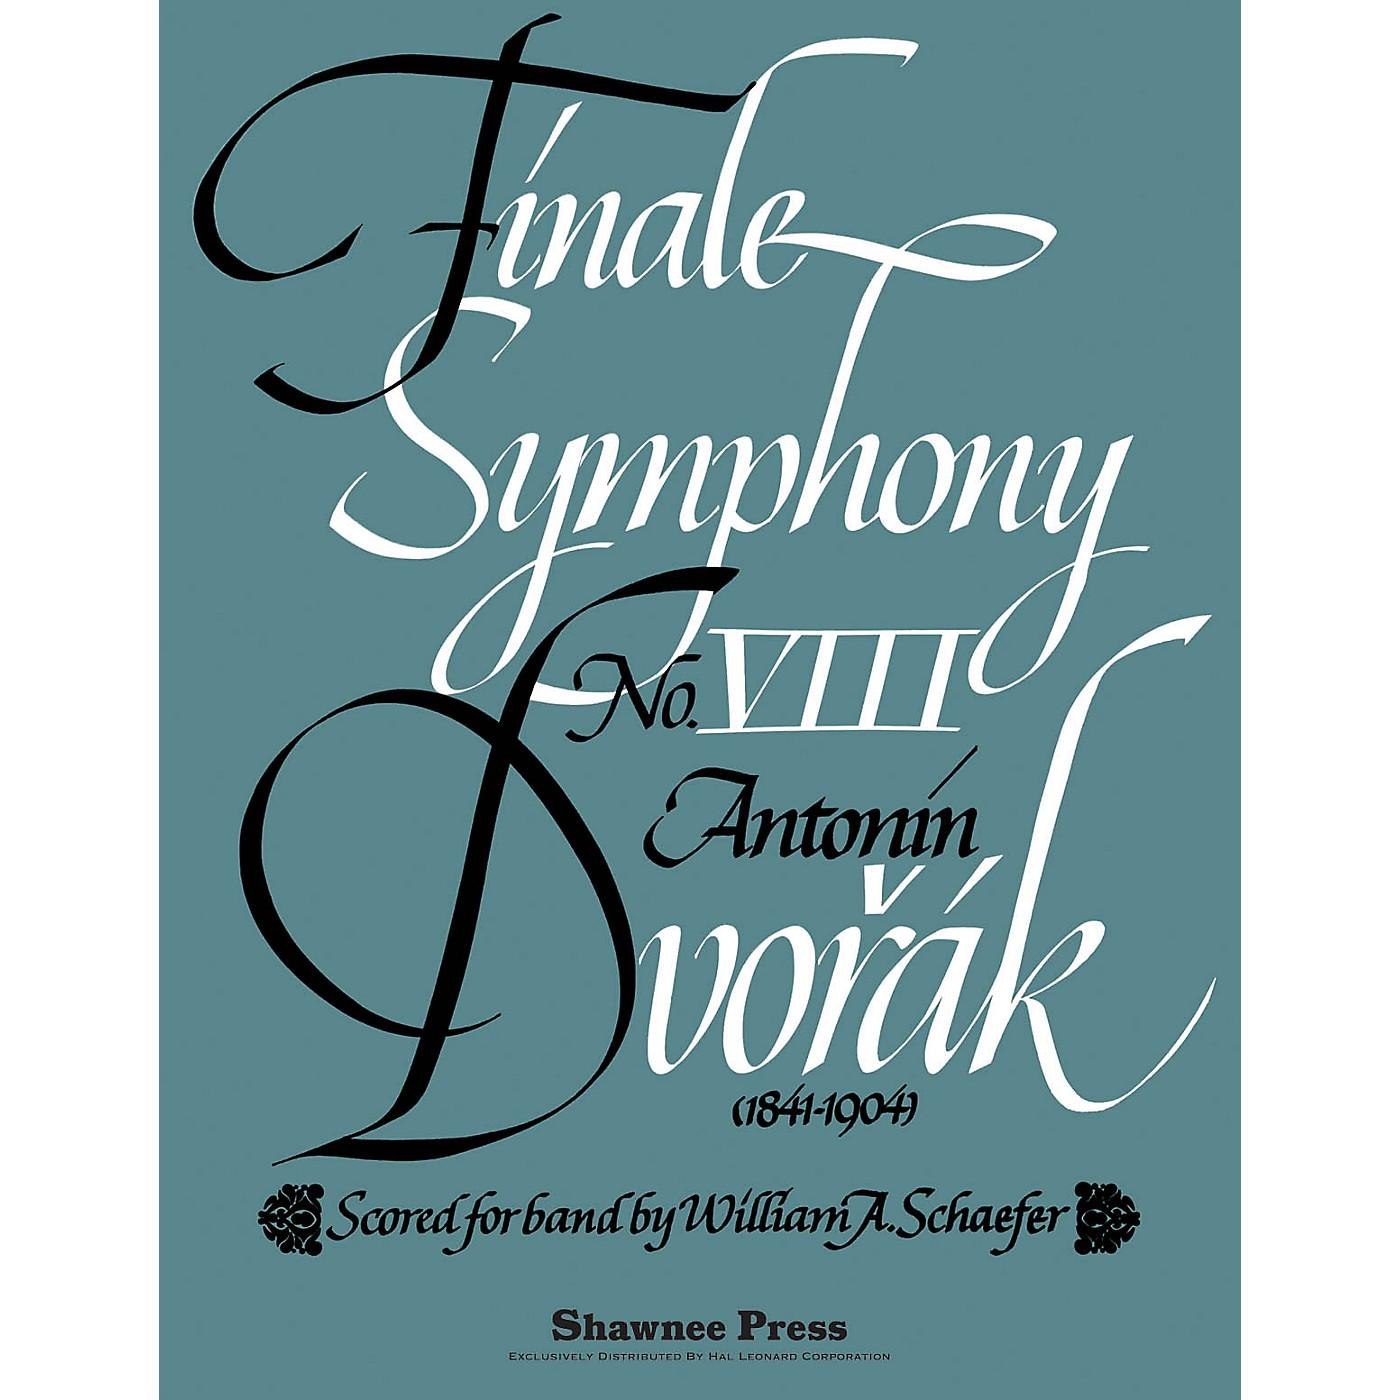 Hal Leonard Finale - Symphony No. 8 Concert Band Level 5 Arranged by Schaefer thumbnail